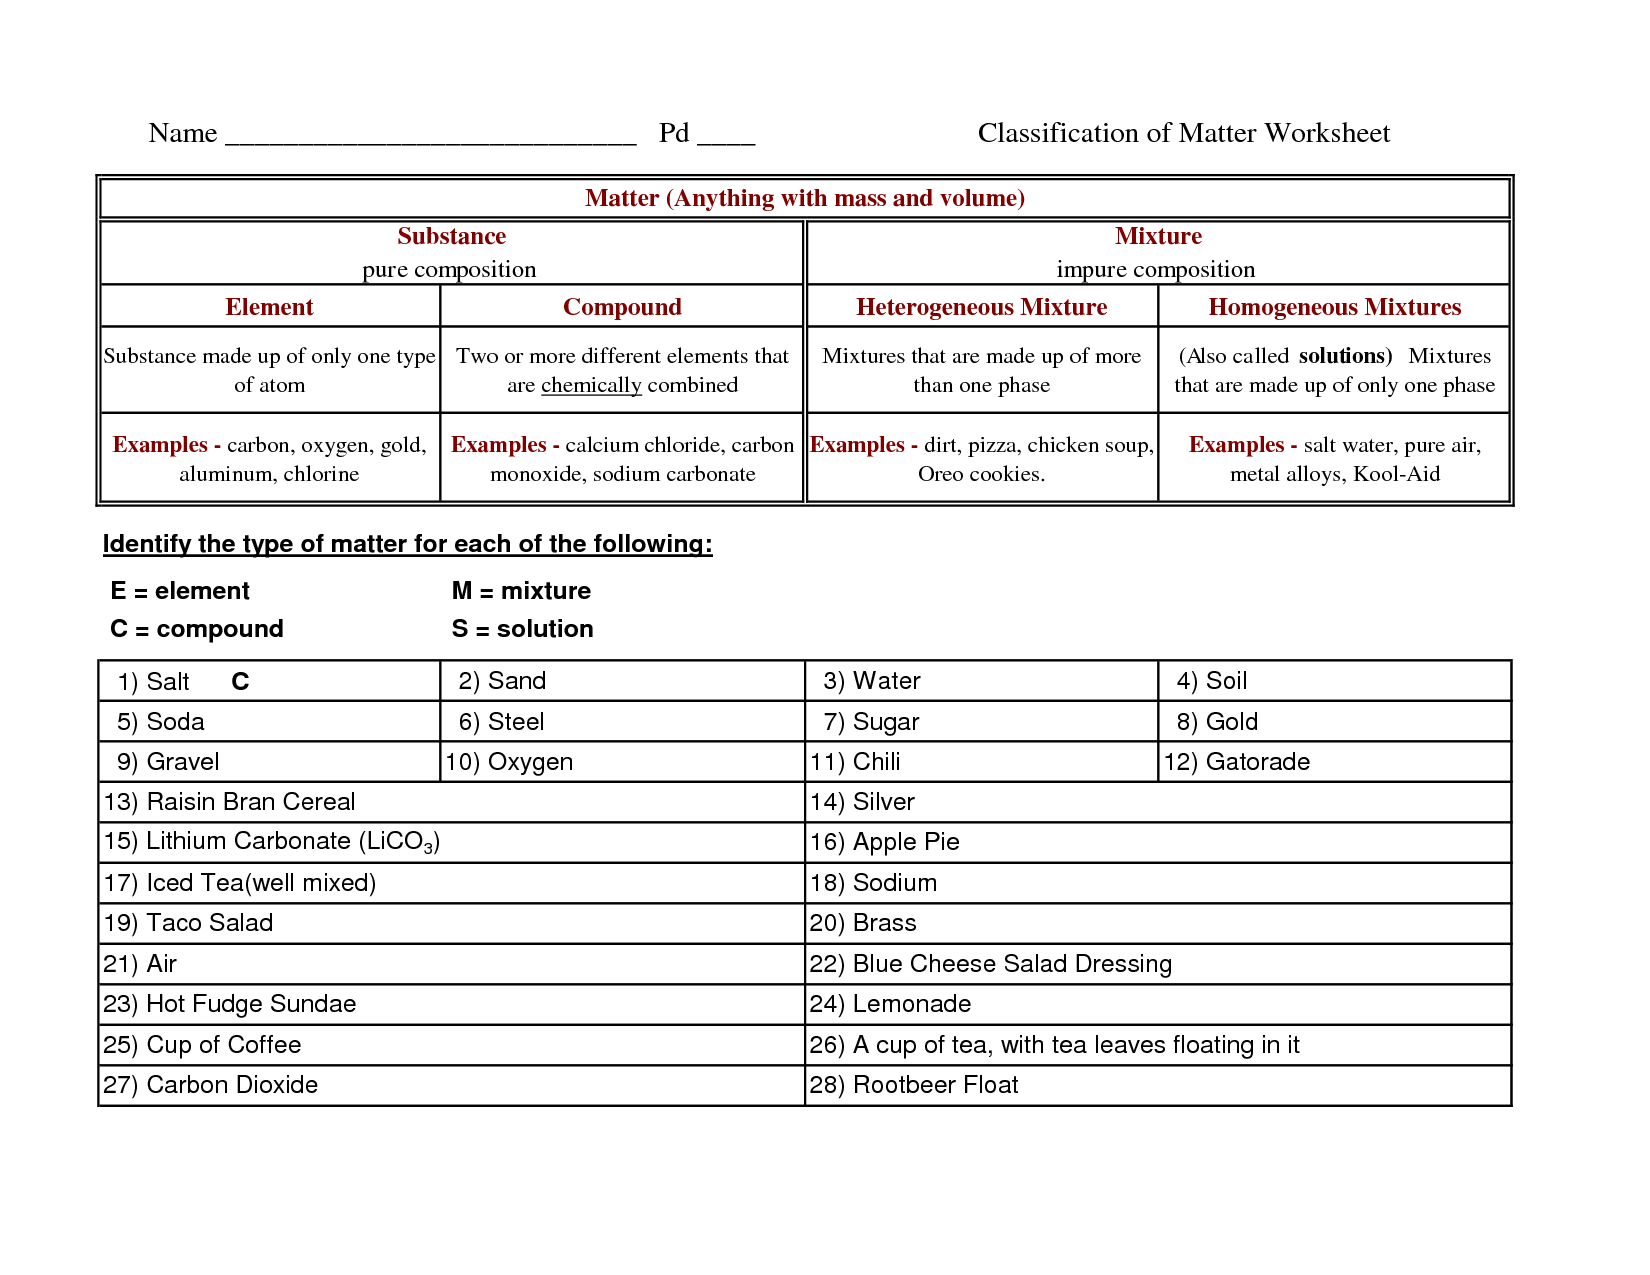 hight resolution of Heterogeneous Vs Homogeneous Worksheet   Printable Worksheets and  Activities for Teachers